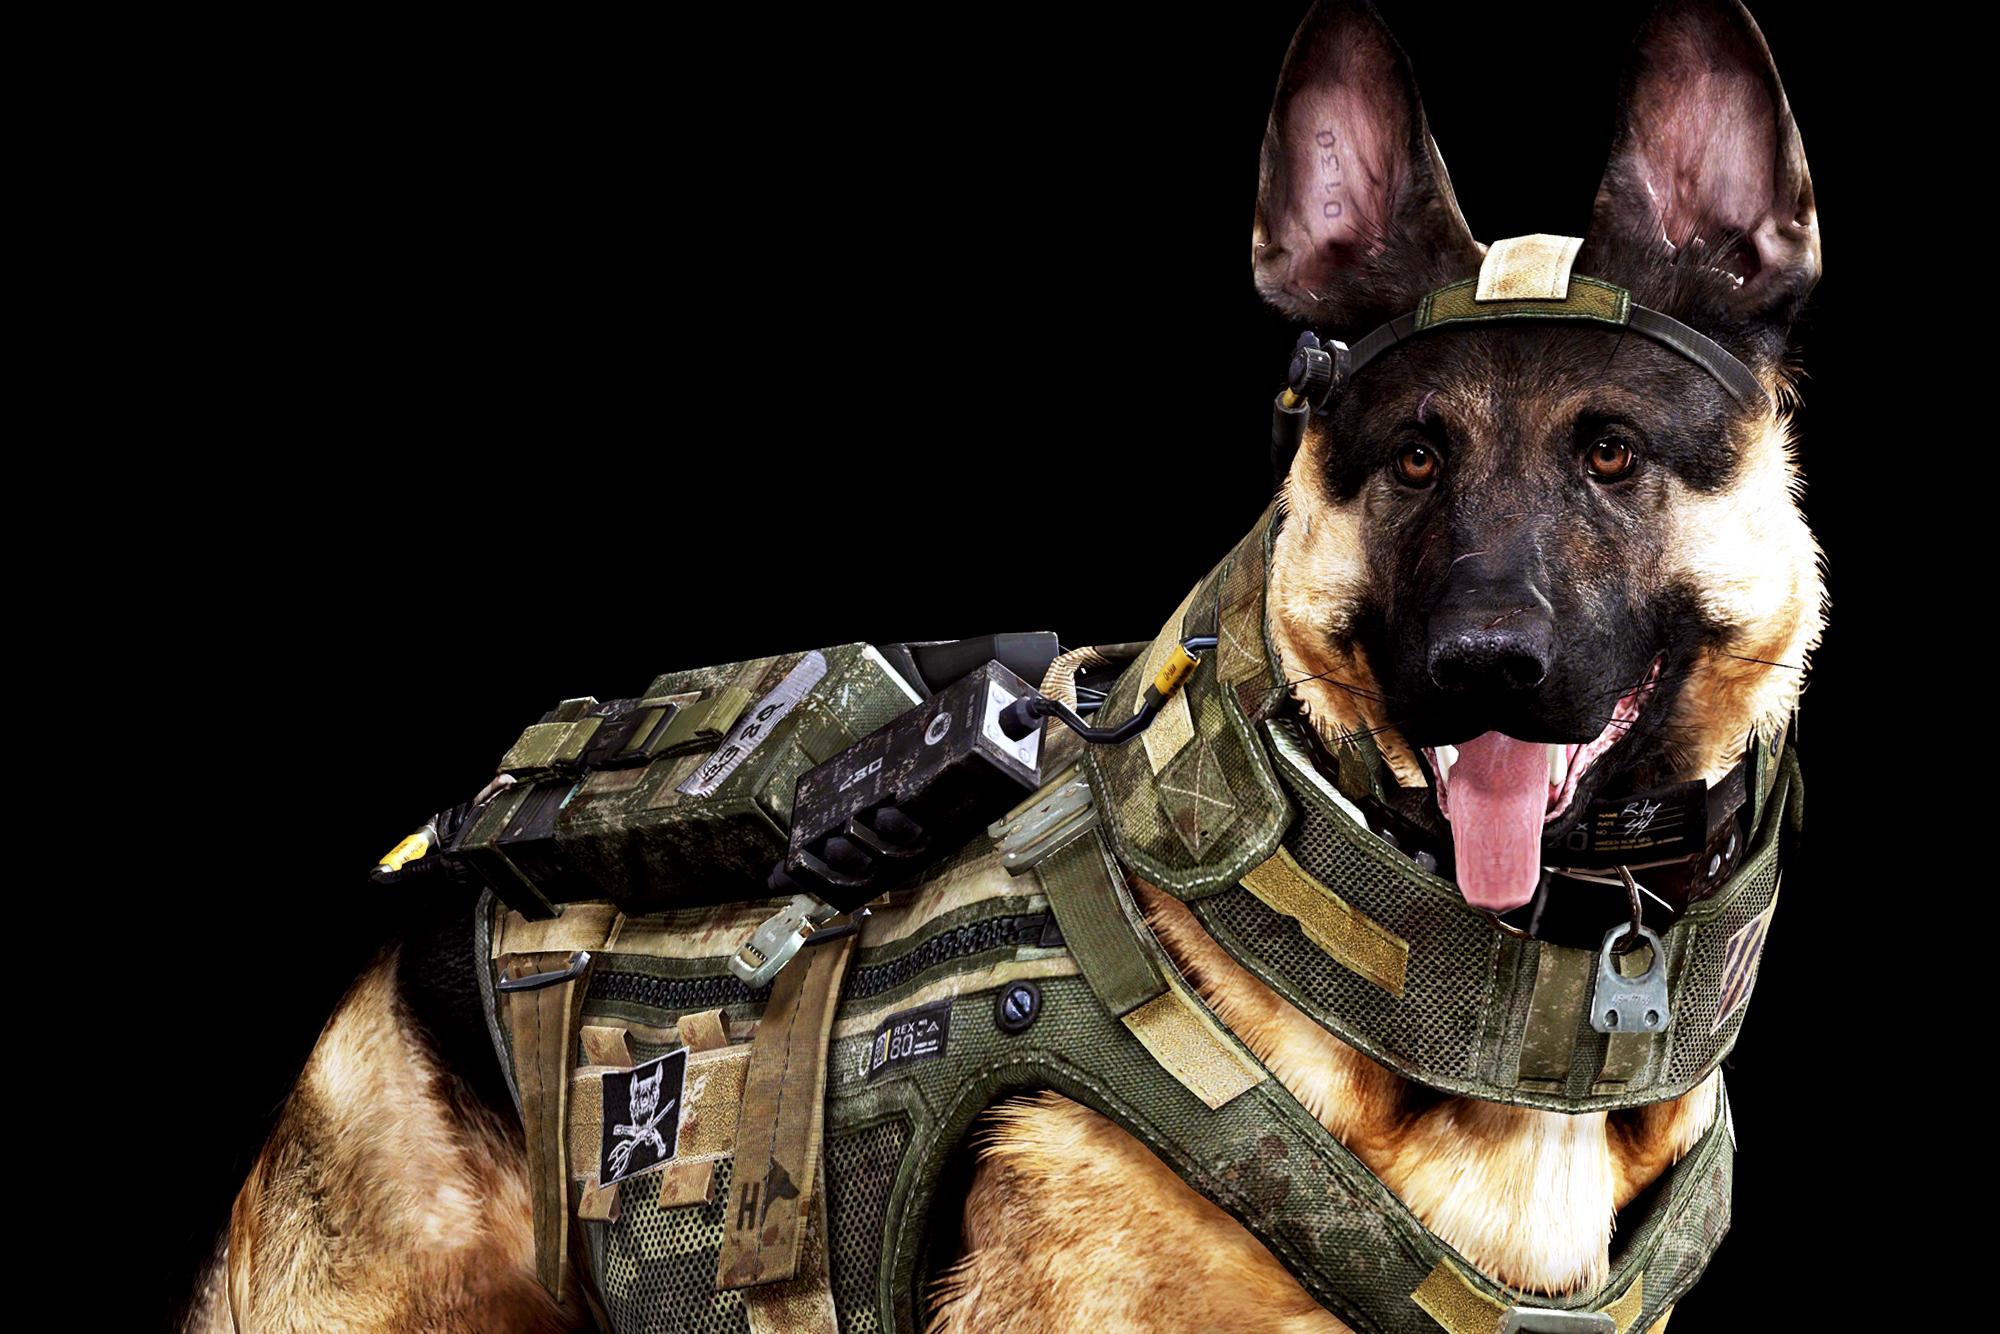 Wallpaper 2000x1334 px army dogs German Shepherd sol r